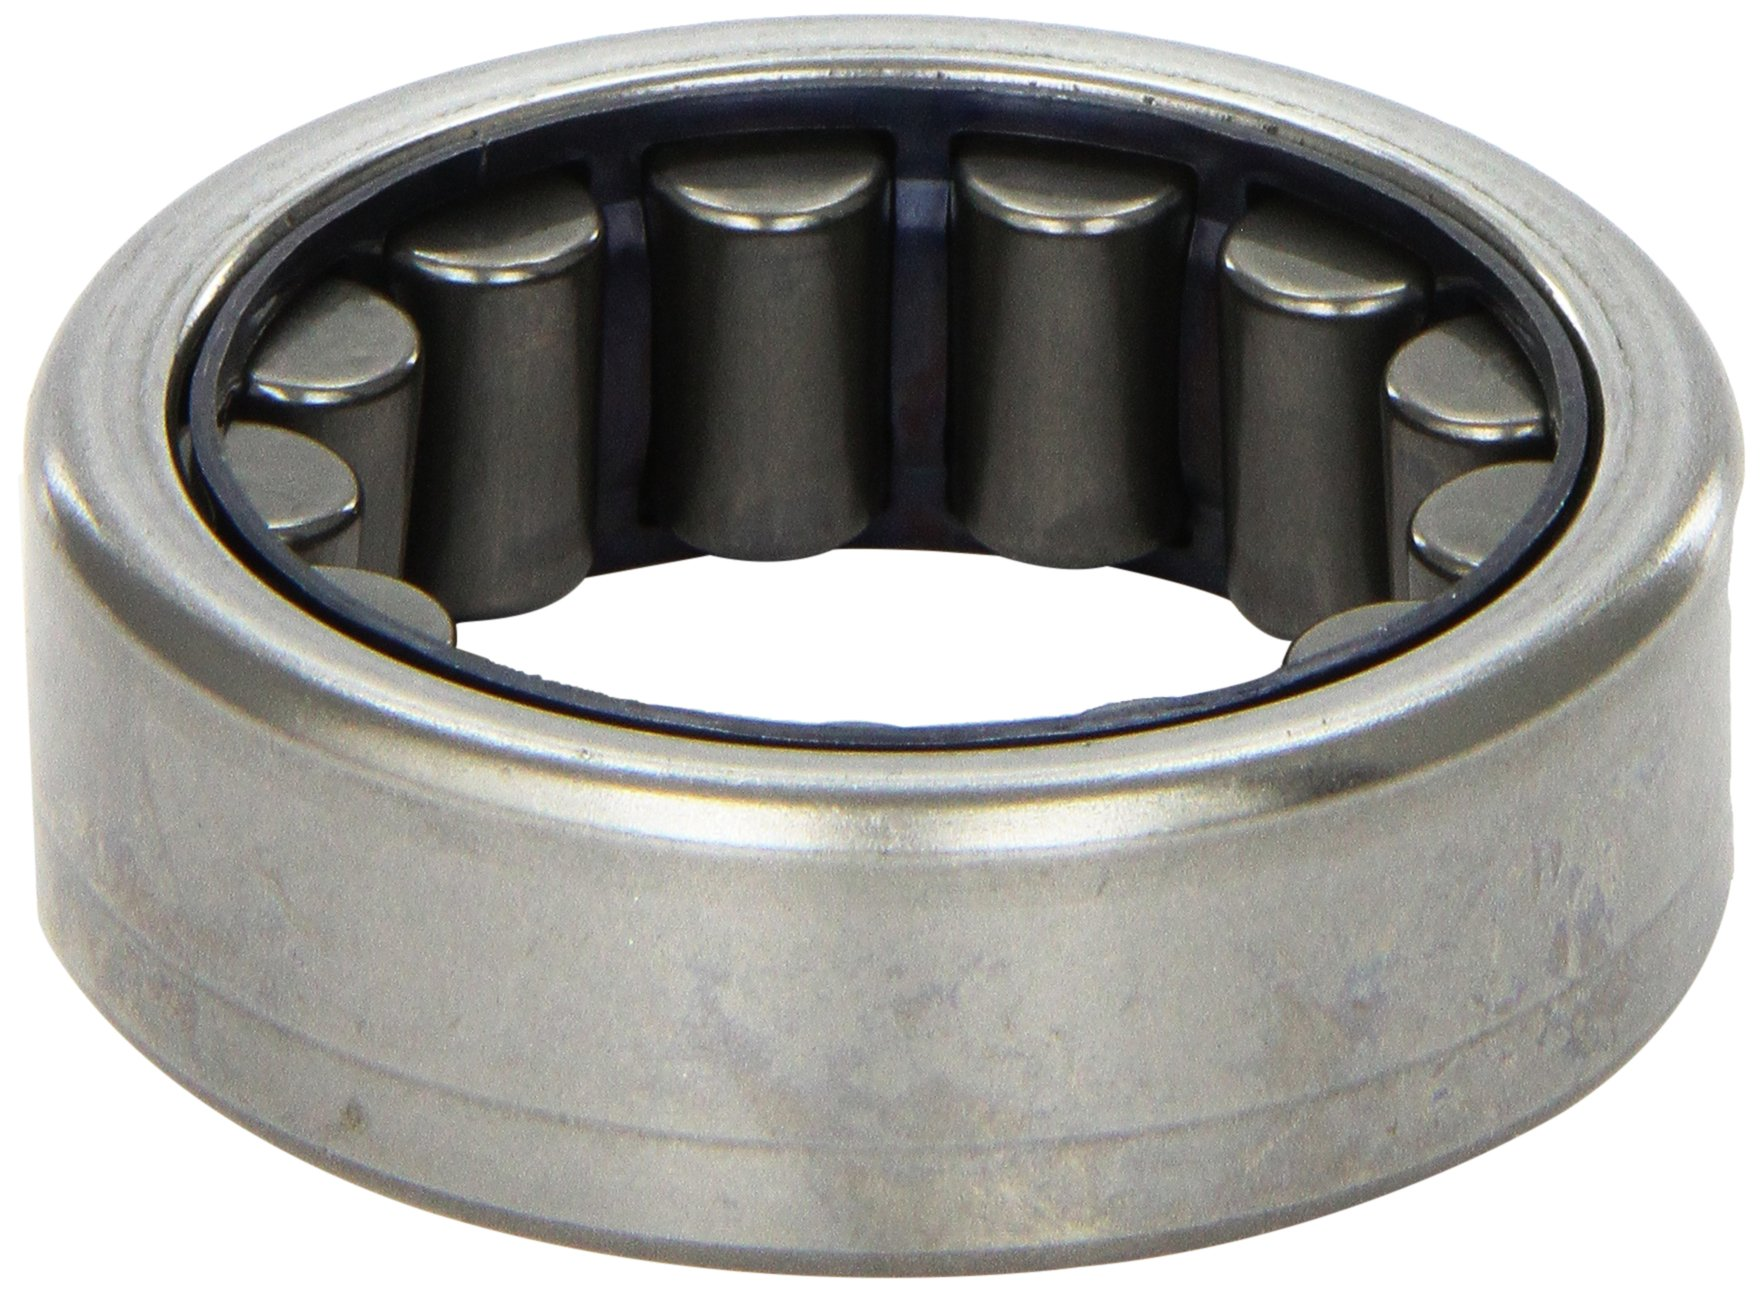 Timken 6408 Cylindrical Wheel Bearing